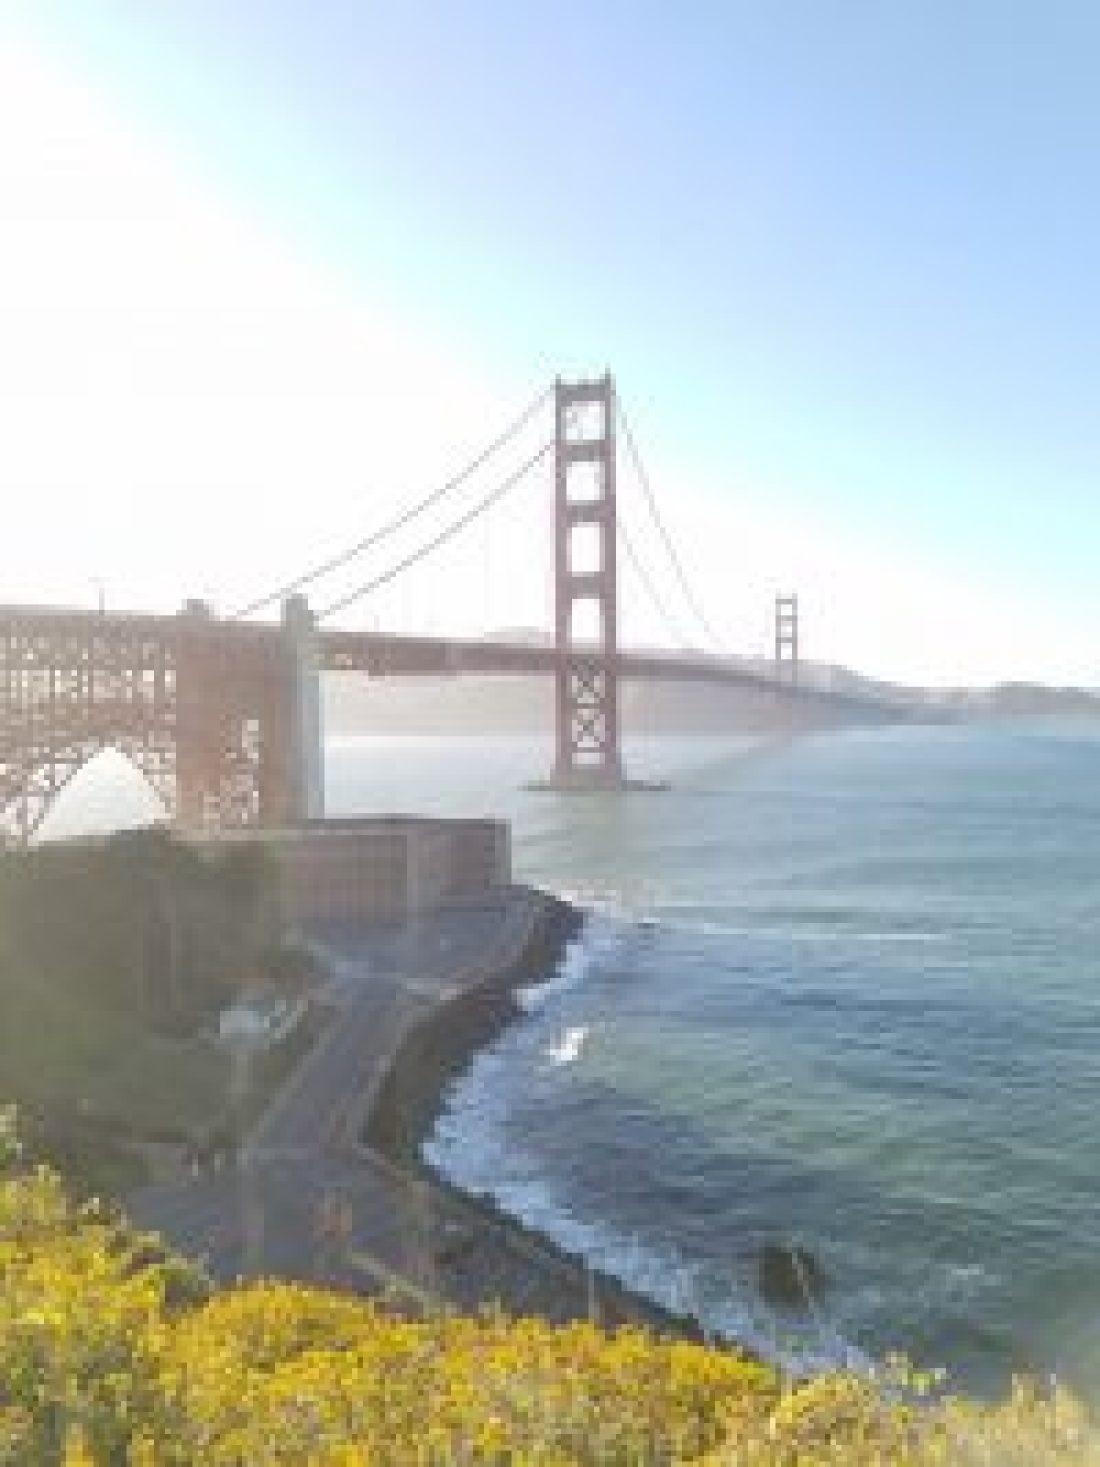 San Francisco Itinerary for 4 days: Golden Gate Bridge